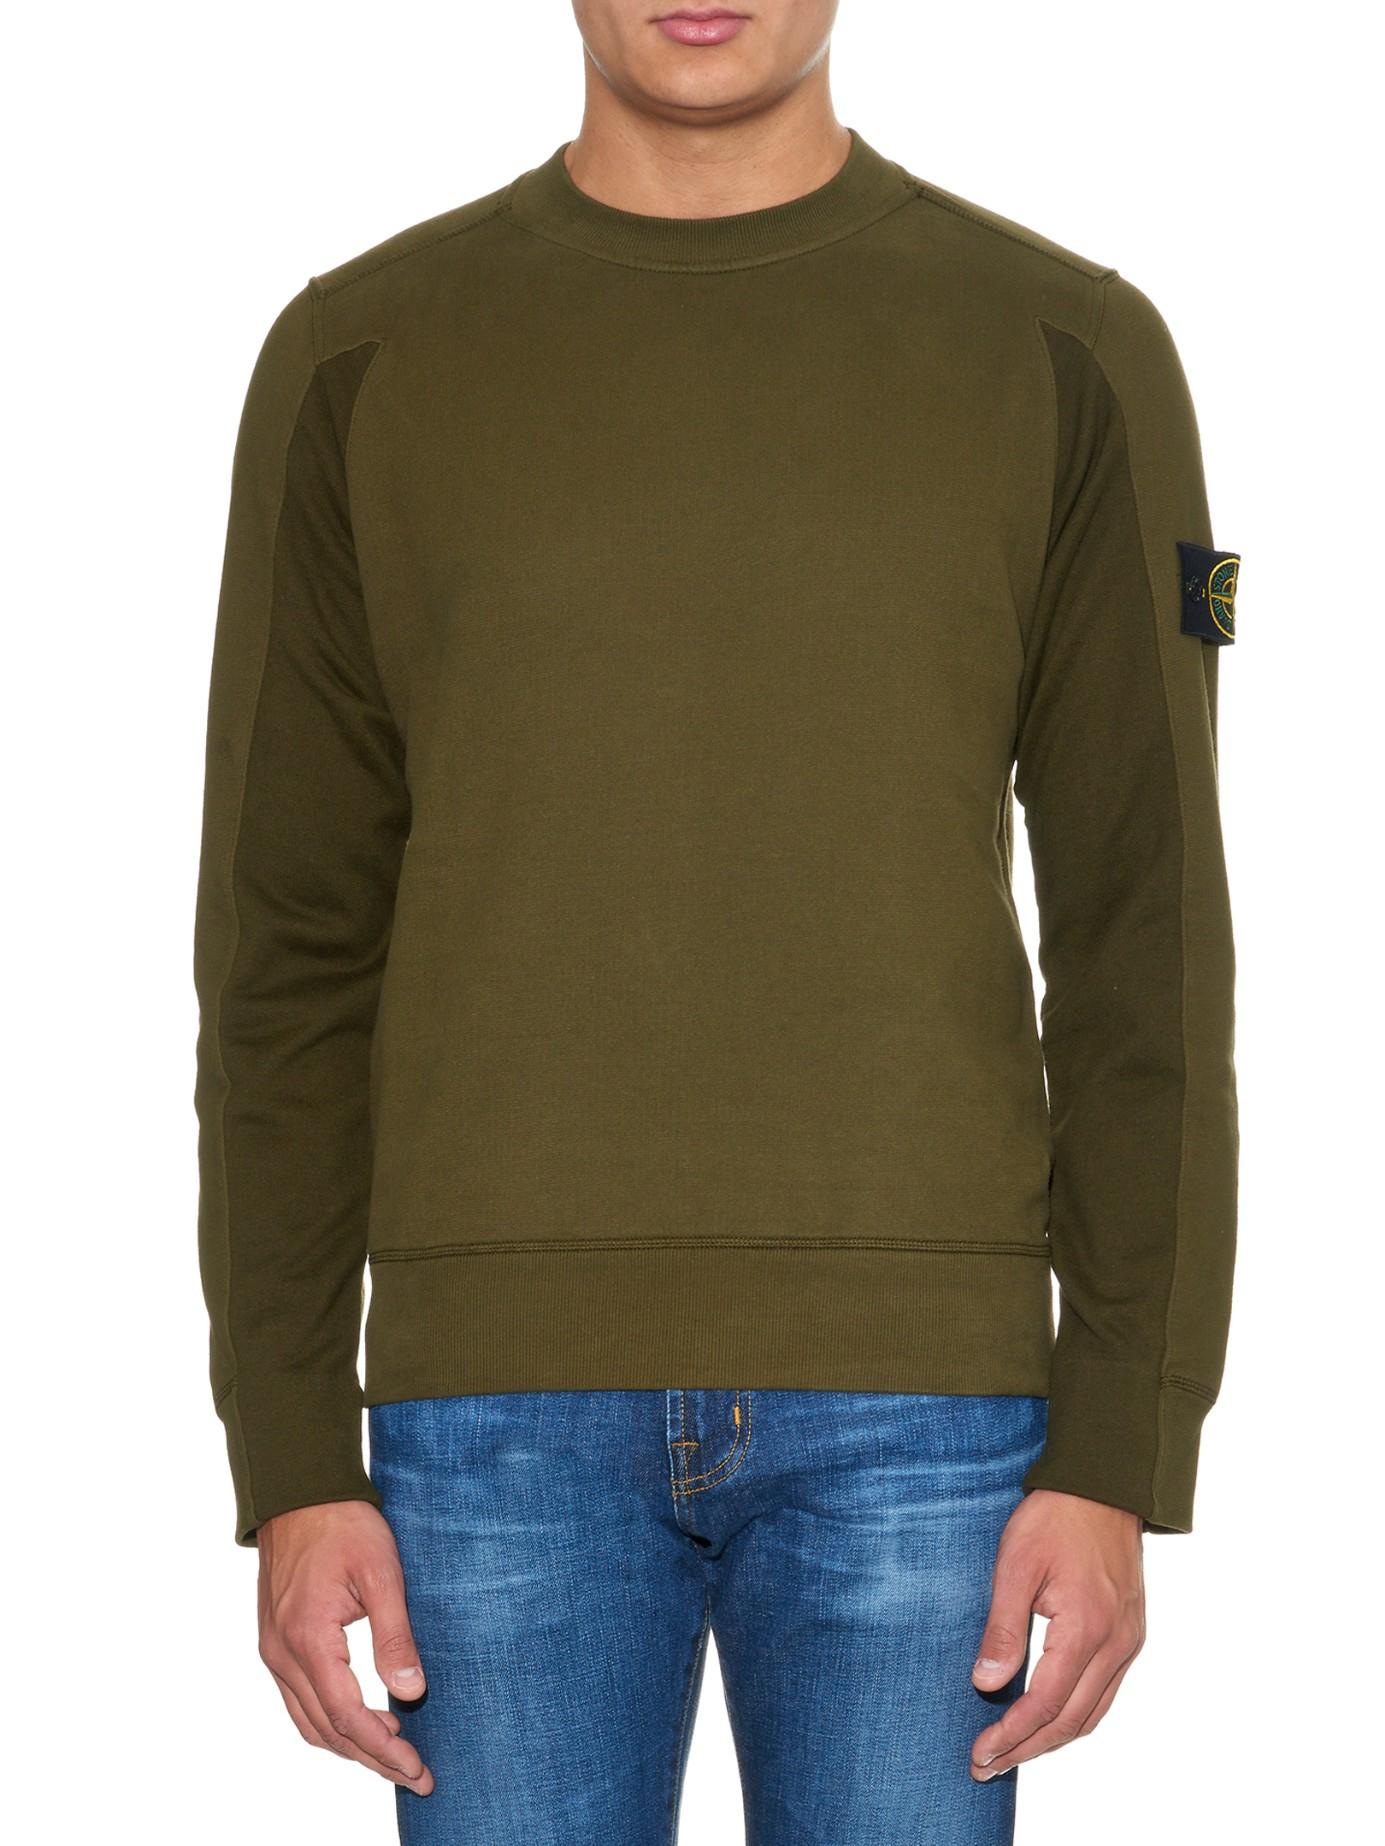 stone island crew neck cotton fleece sweatshirt in brown. Black Bedroom Furniture Sets. Home Design Ideas